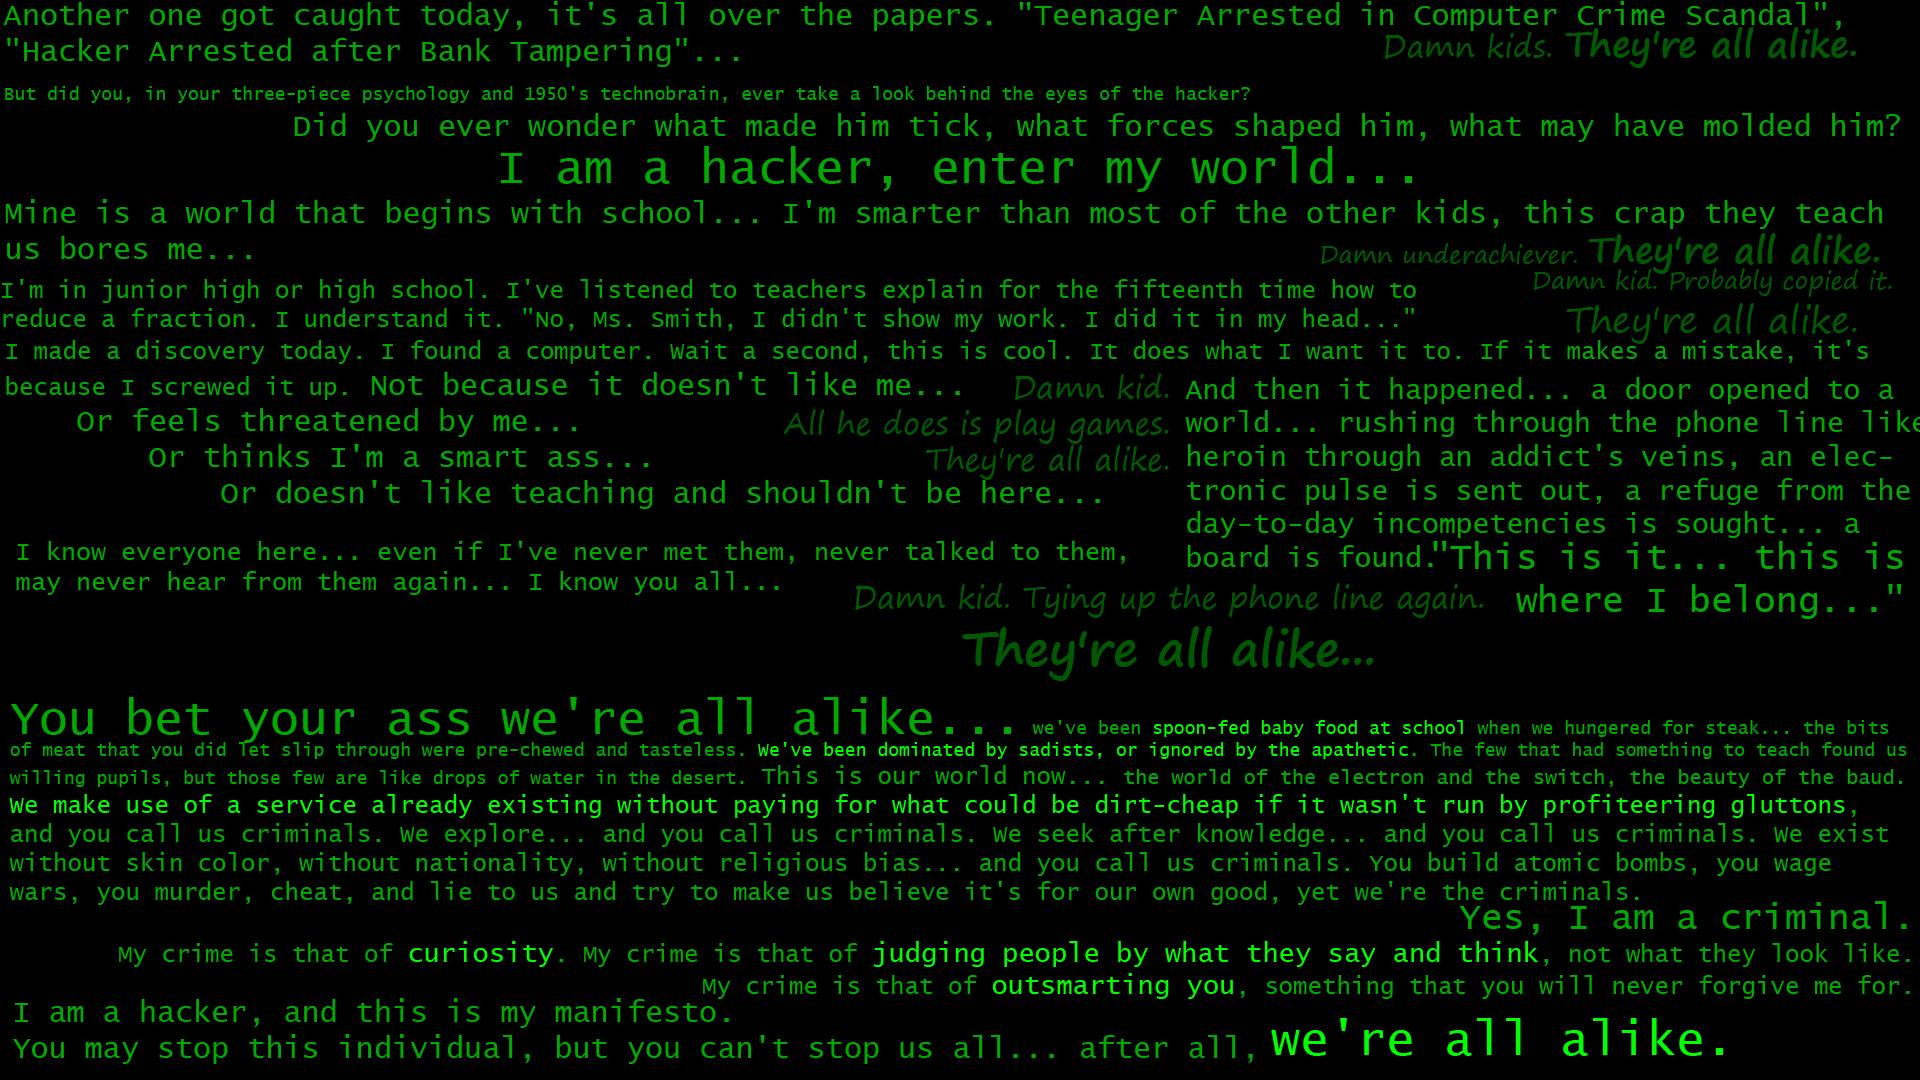 Hacker Computer Sadic Dark Anarchy 46 Wallpaper  1920x1080 219173 WallpaperUP